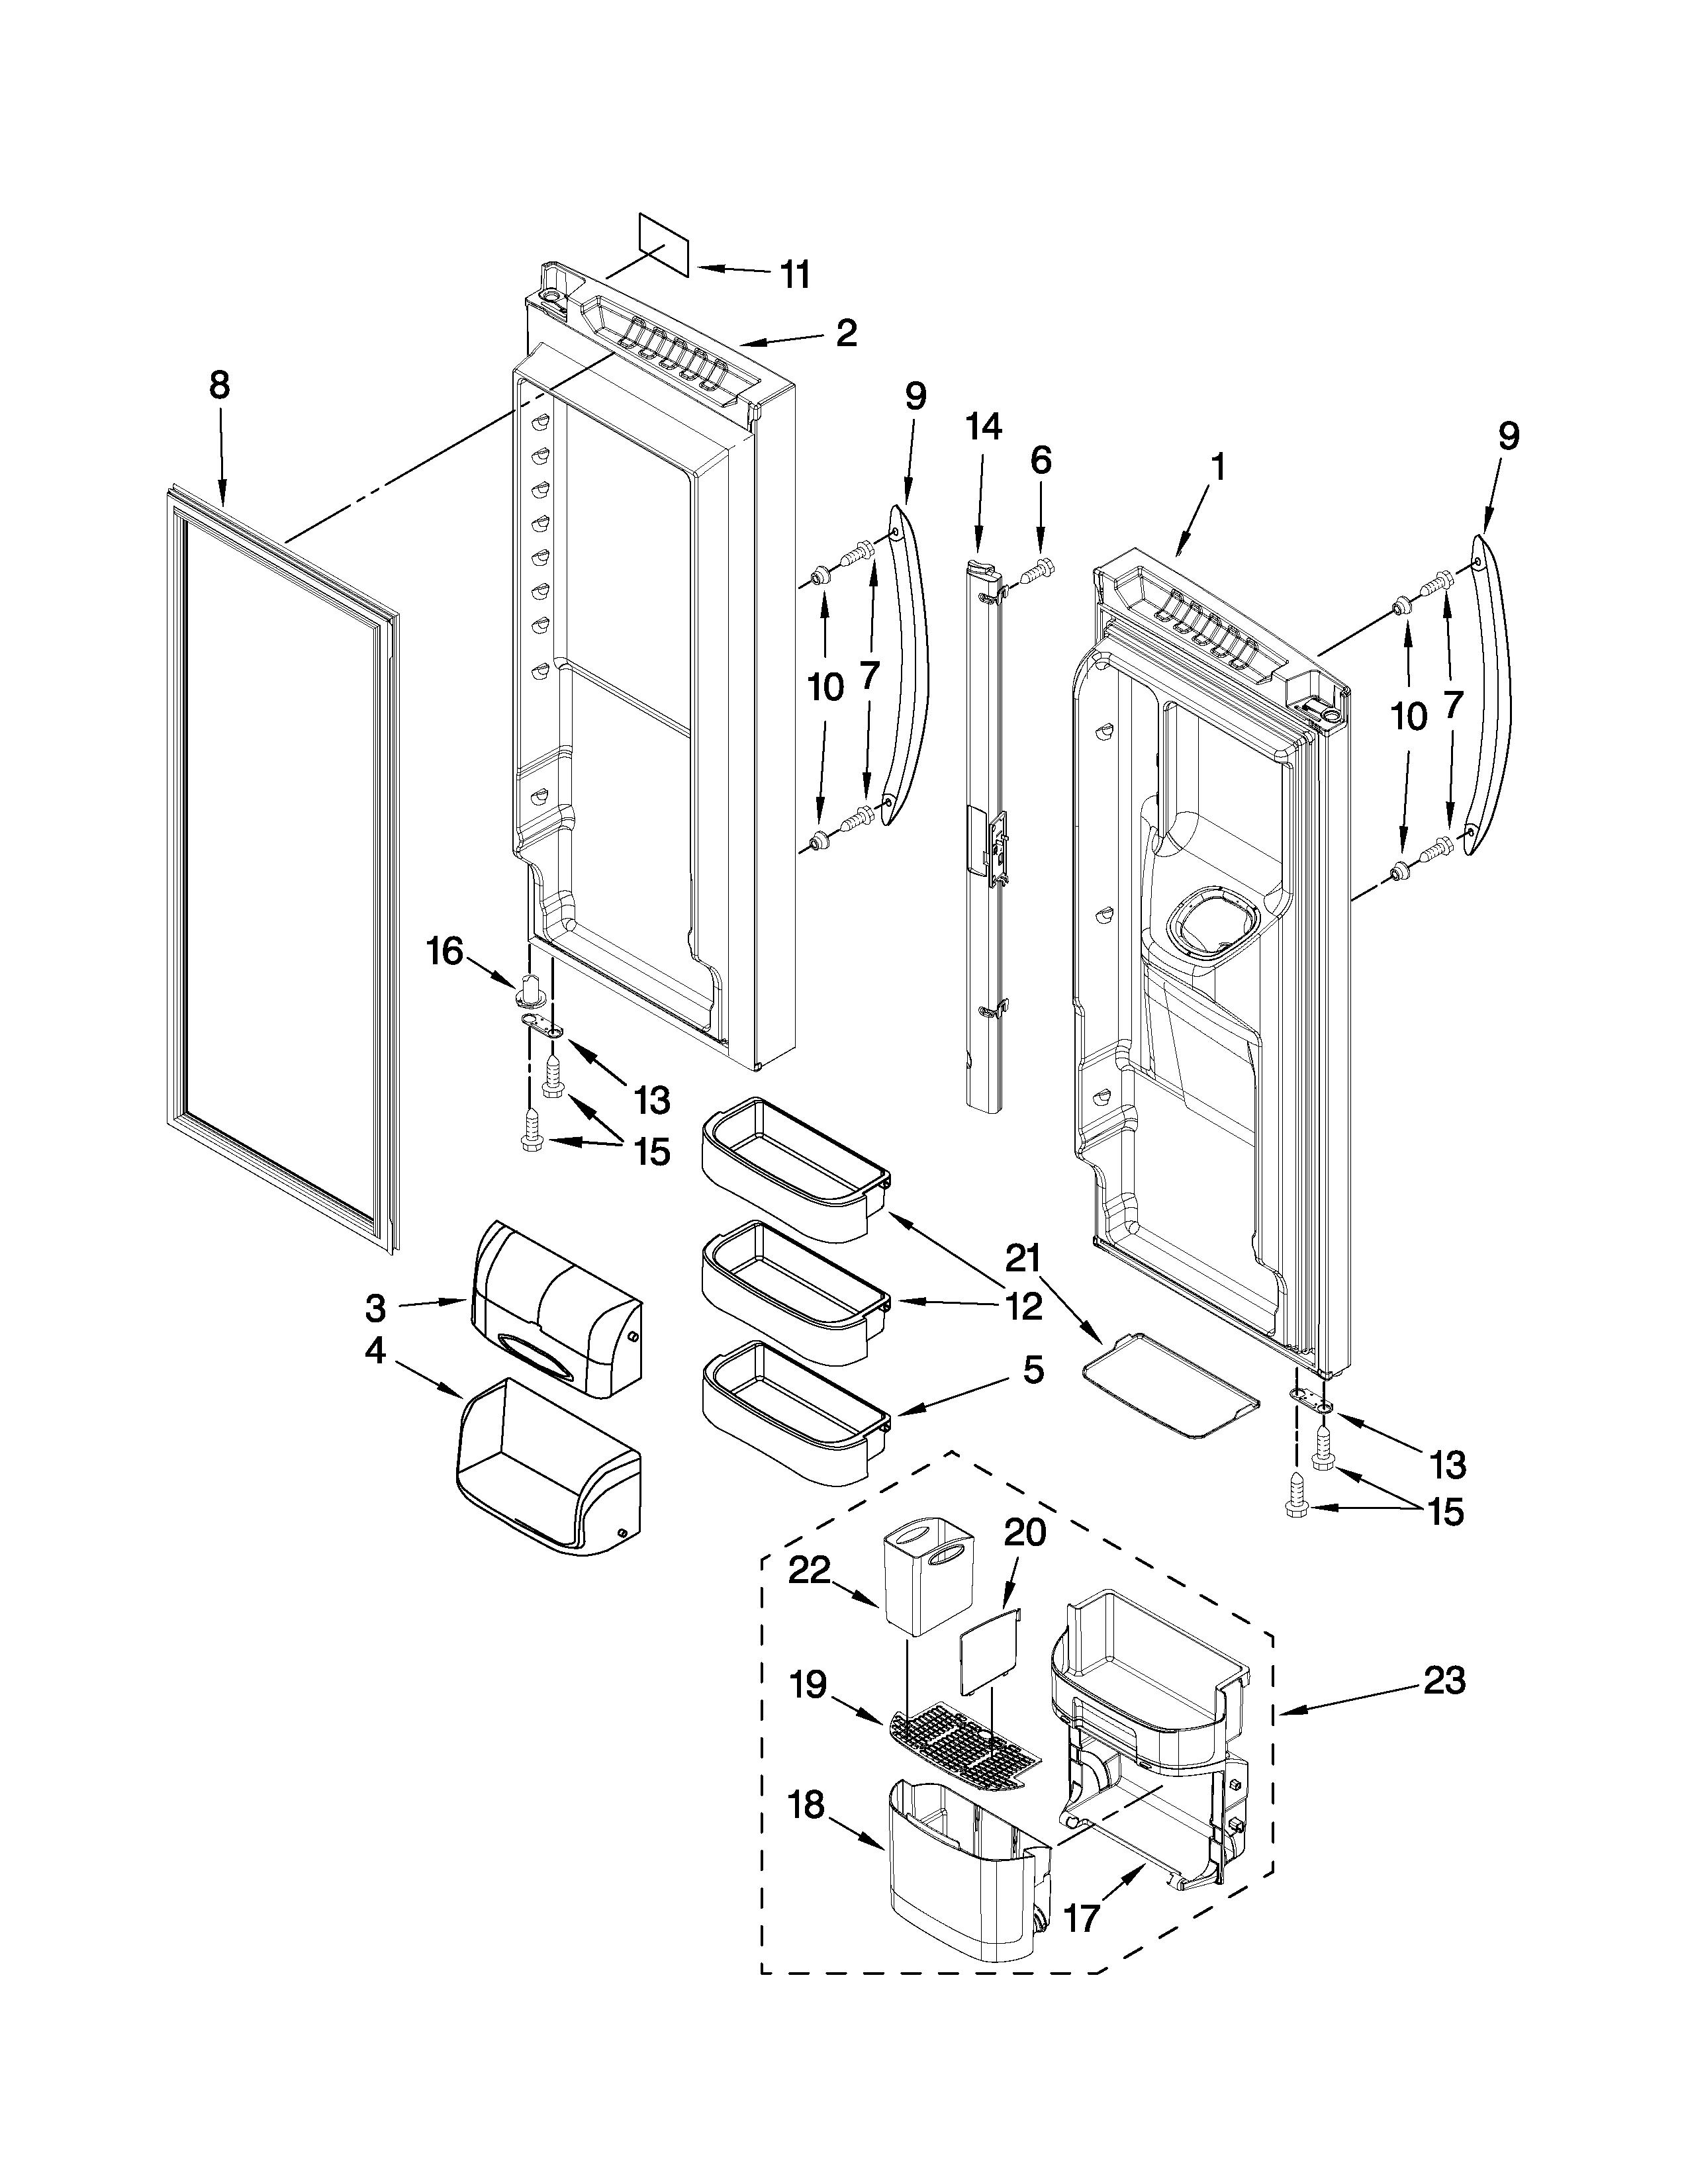 KENMORE ELITE Bottom-Mount Refrigerator Cabinet Parts